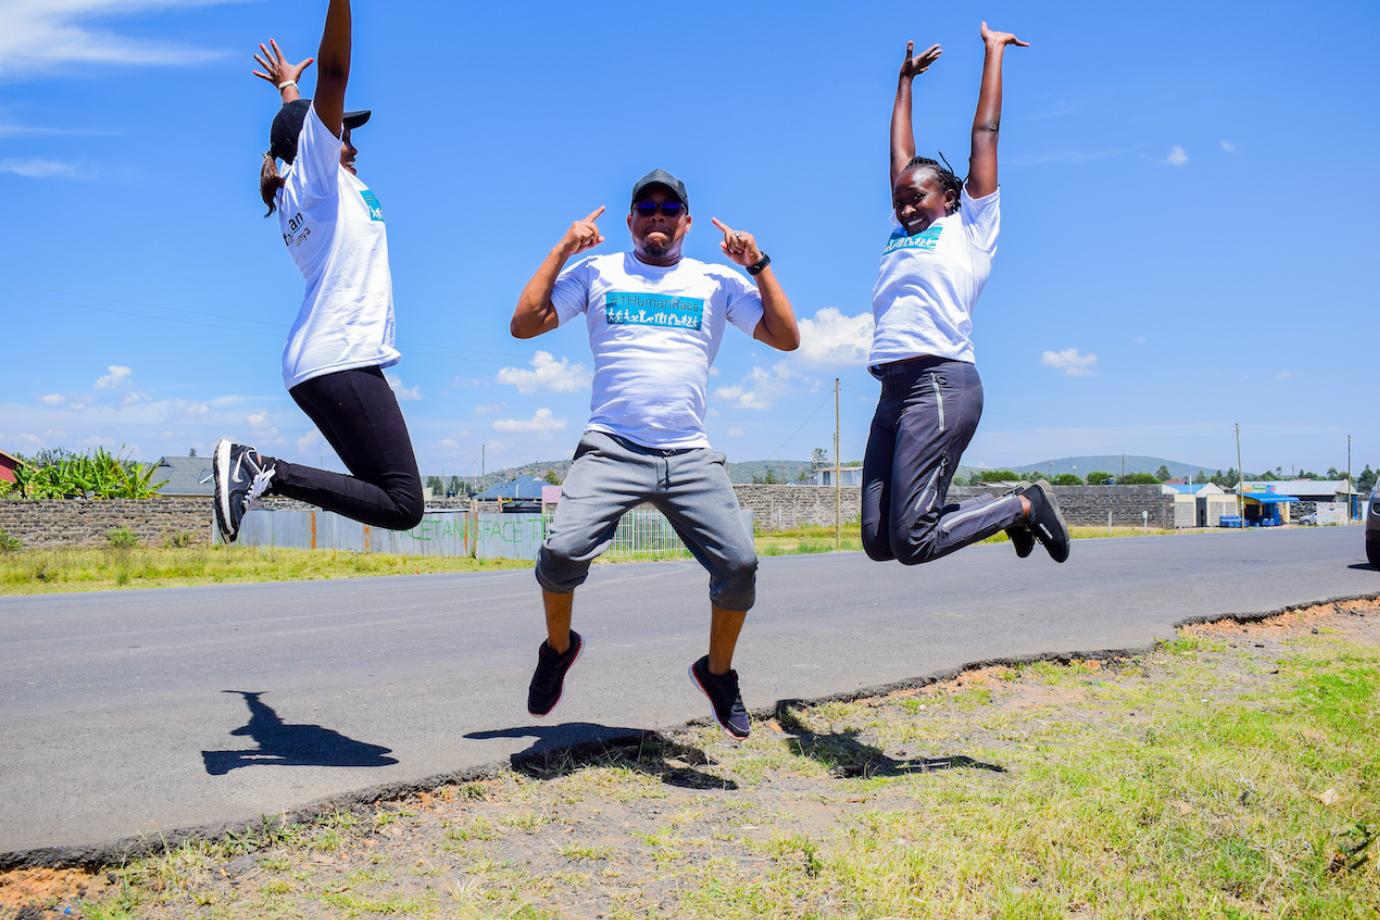 Team Jumps for Joy